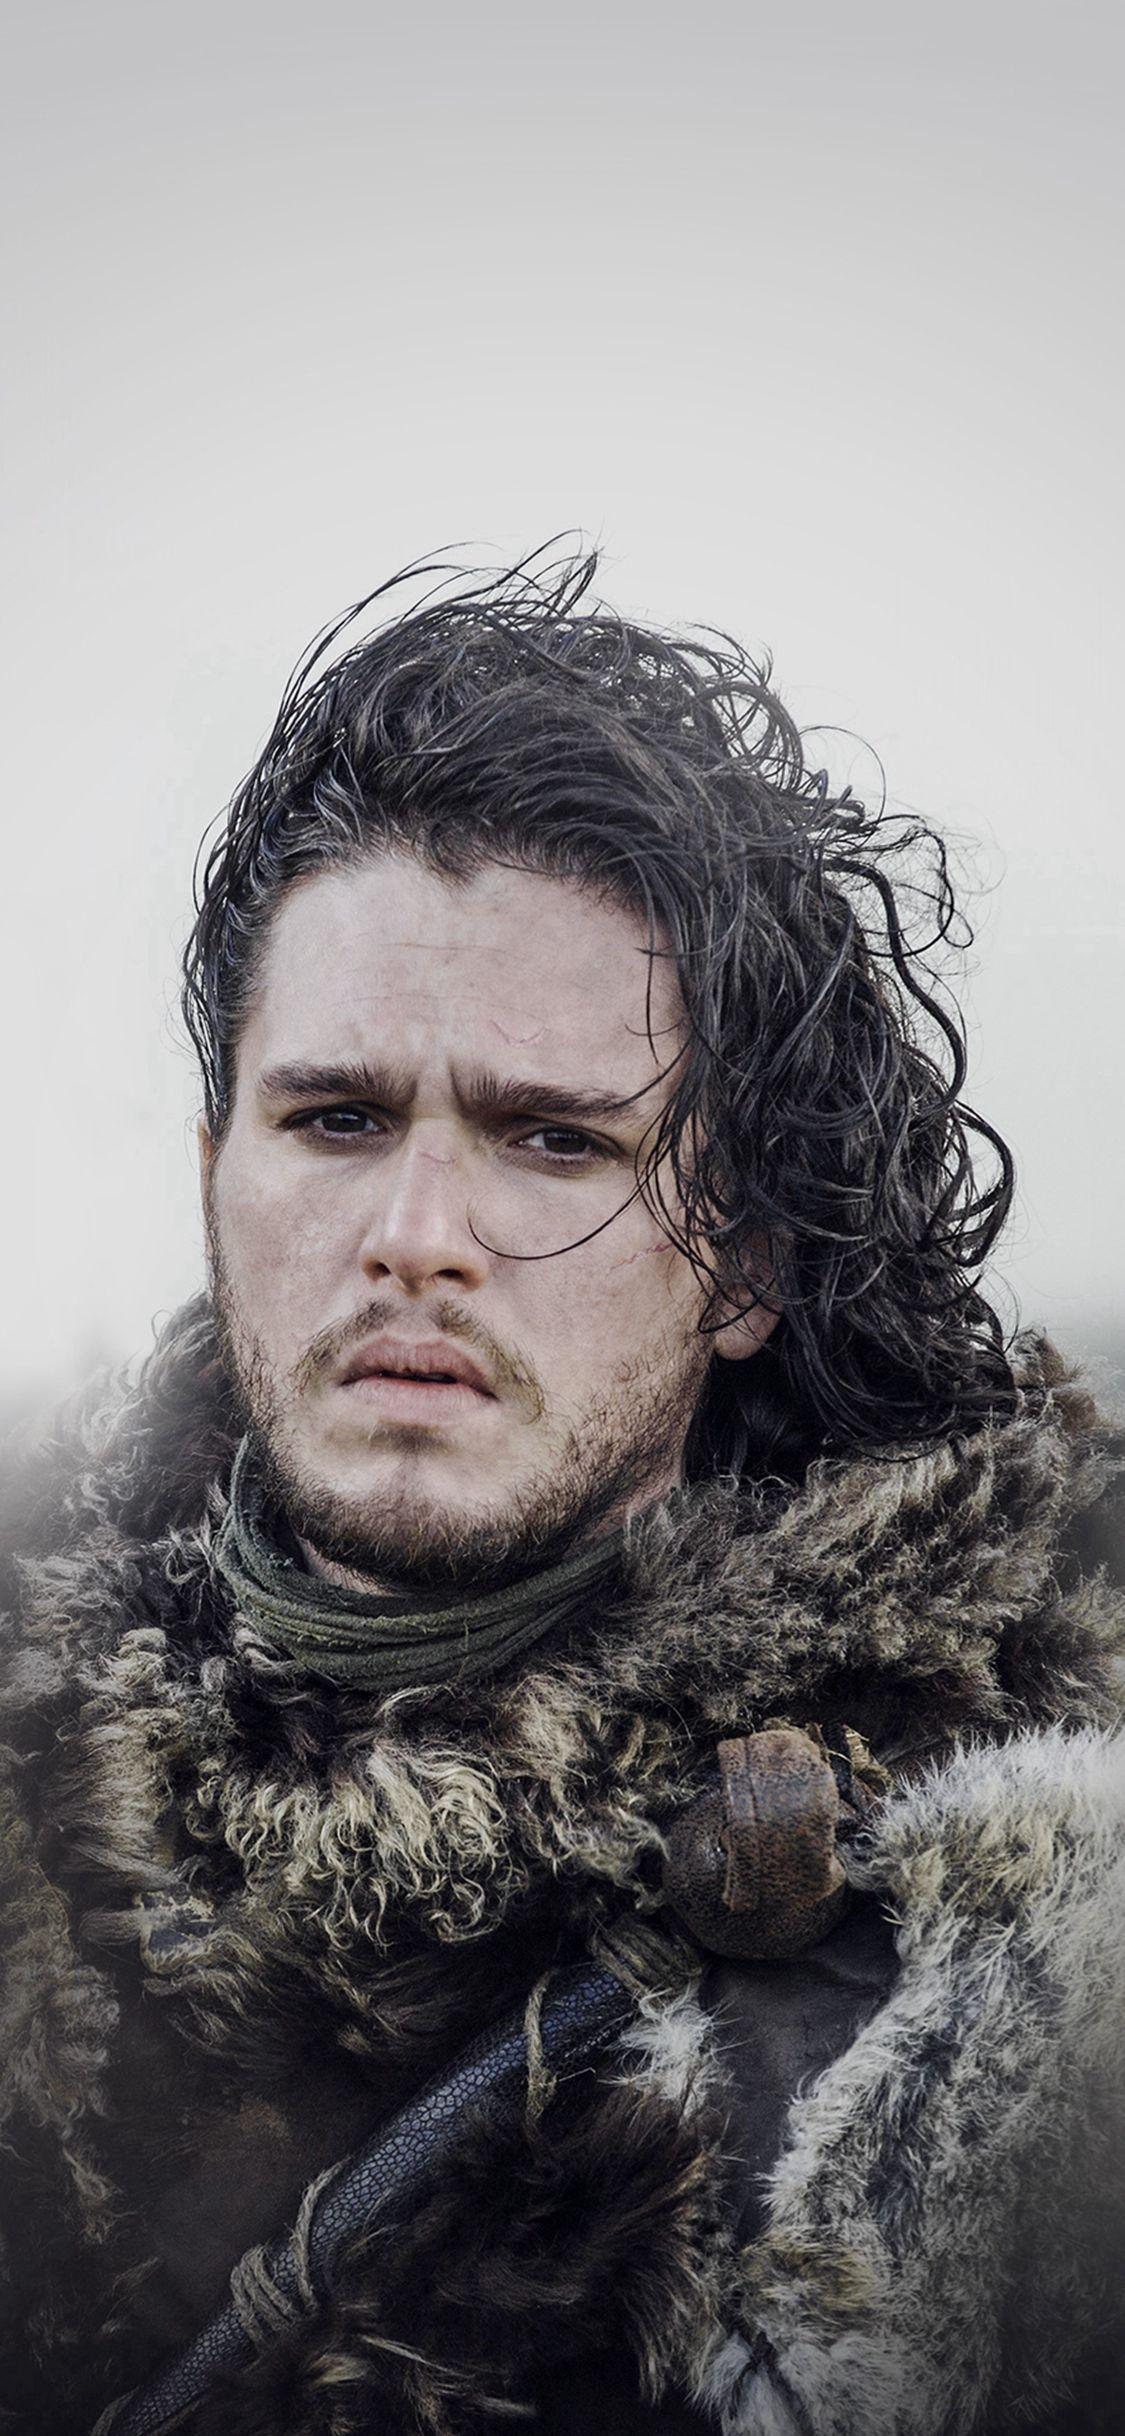 Jon Snow Game Of Thrones Film Art Iphone X Wallpaper Snow Wallpaper Iphone Jon Snow Aesthetic Film Art